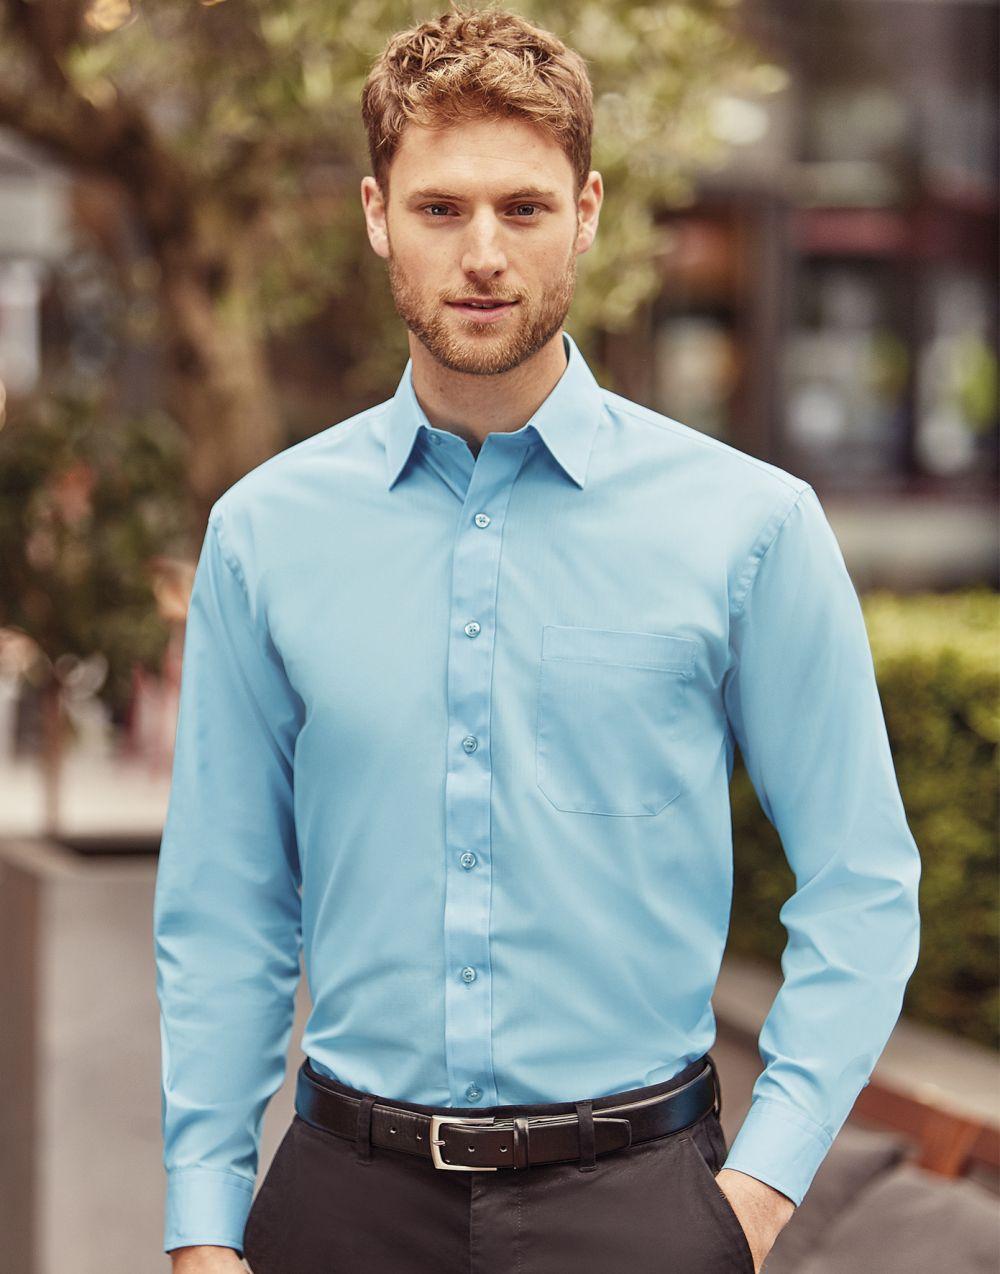 Camisas manga larga russell de hombre popelin manga larga vista 4